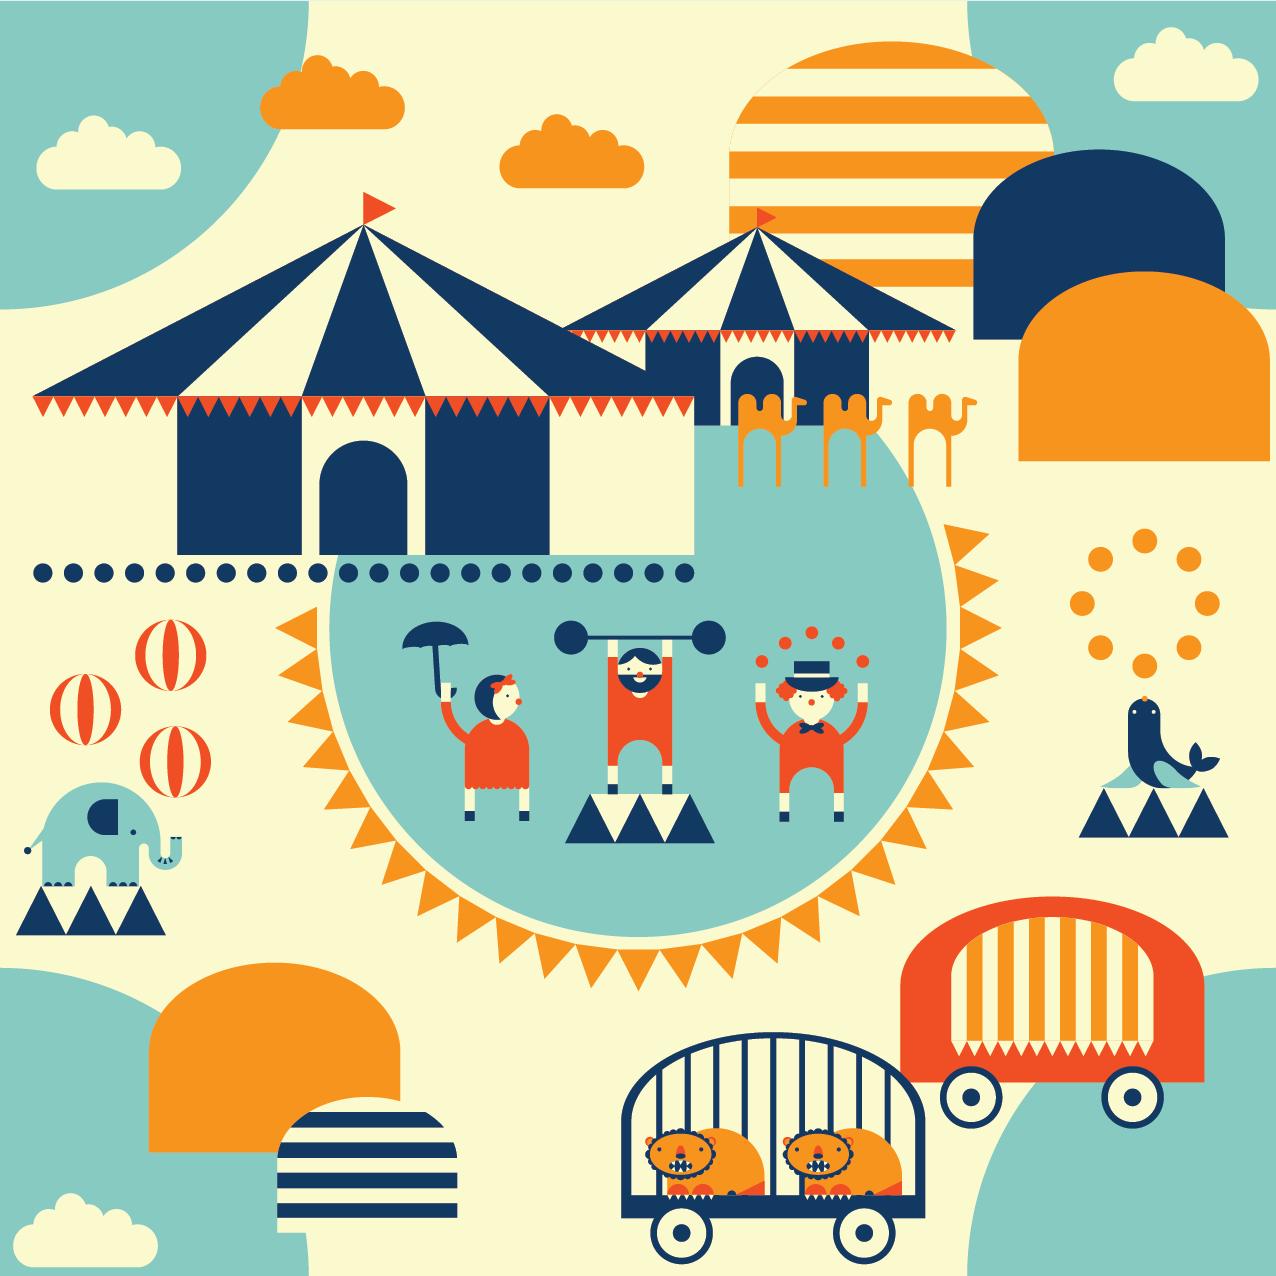 http://www.wform.dk/wp/wp-content/uploads/wform_wallpaper_circus.png ...